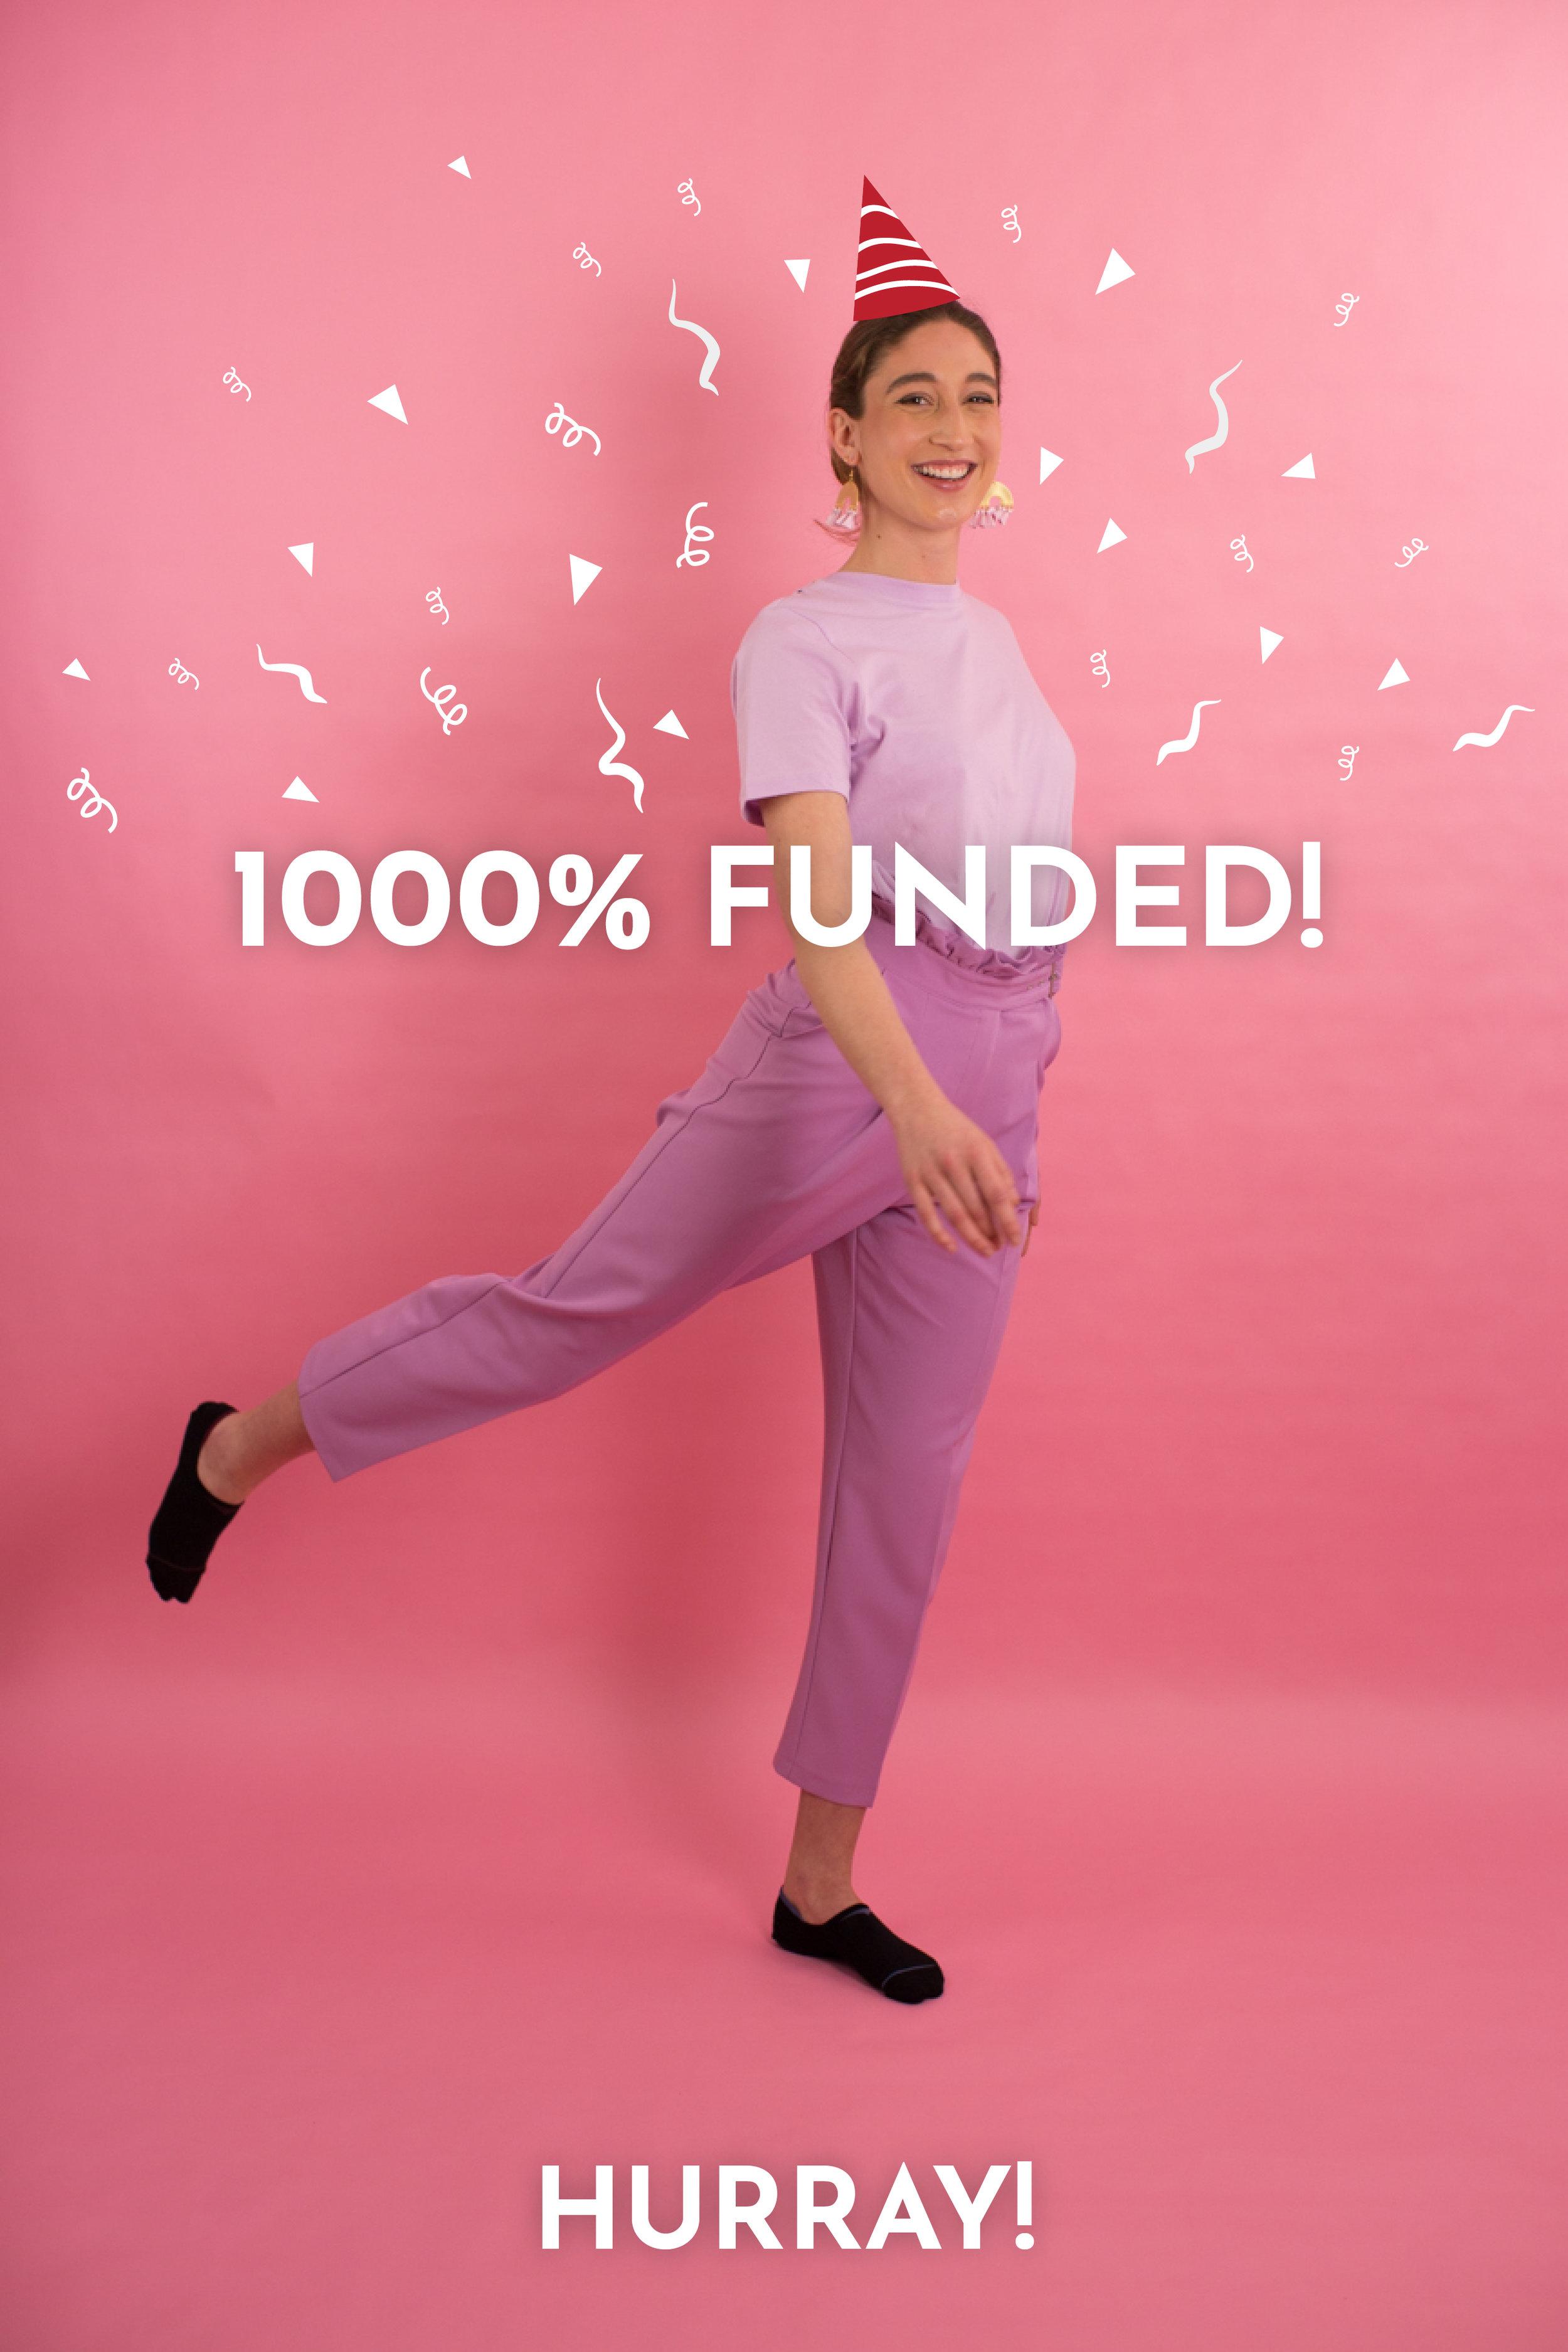 Updates_1000% funded.jpg